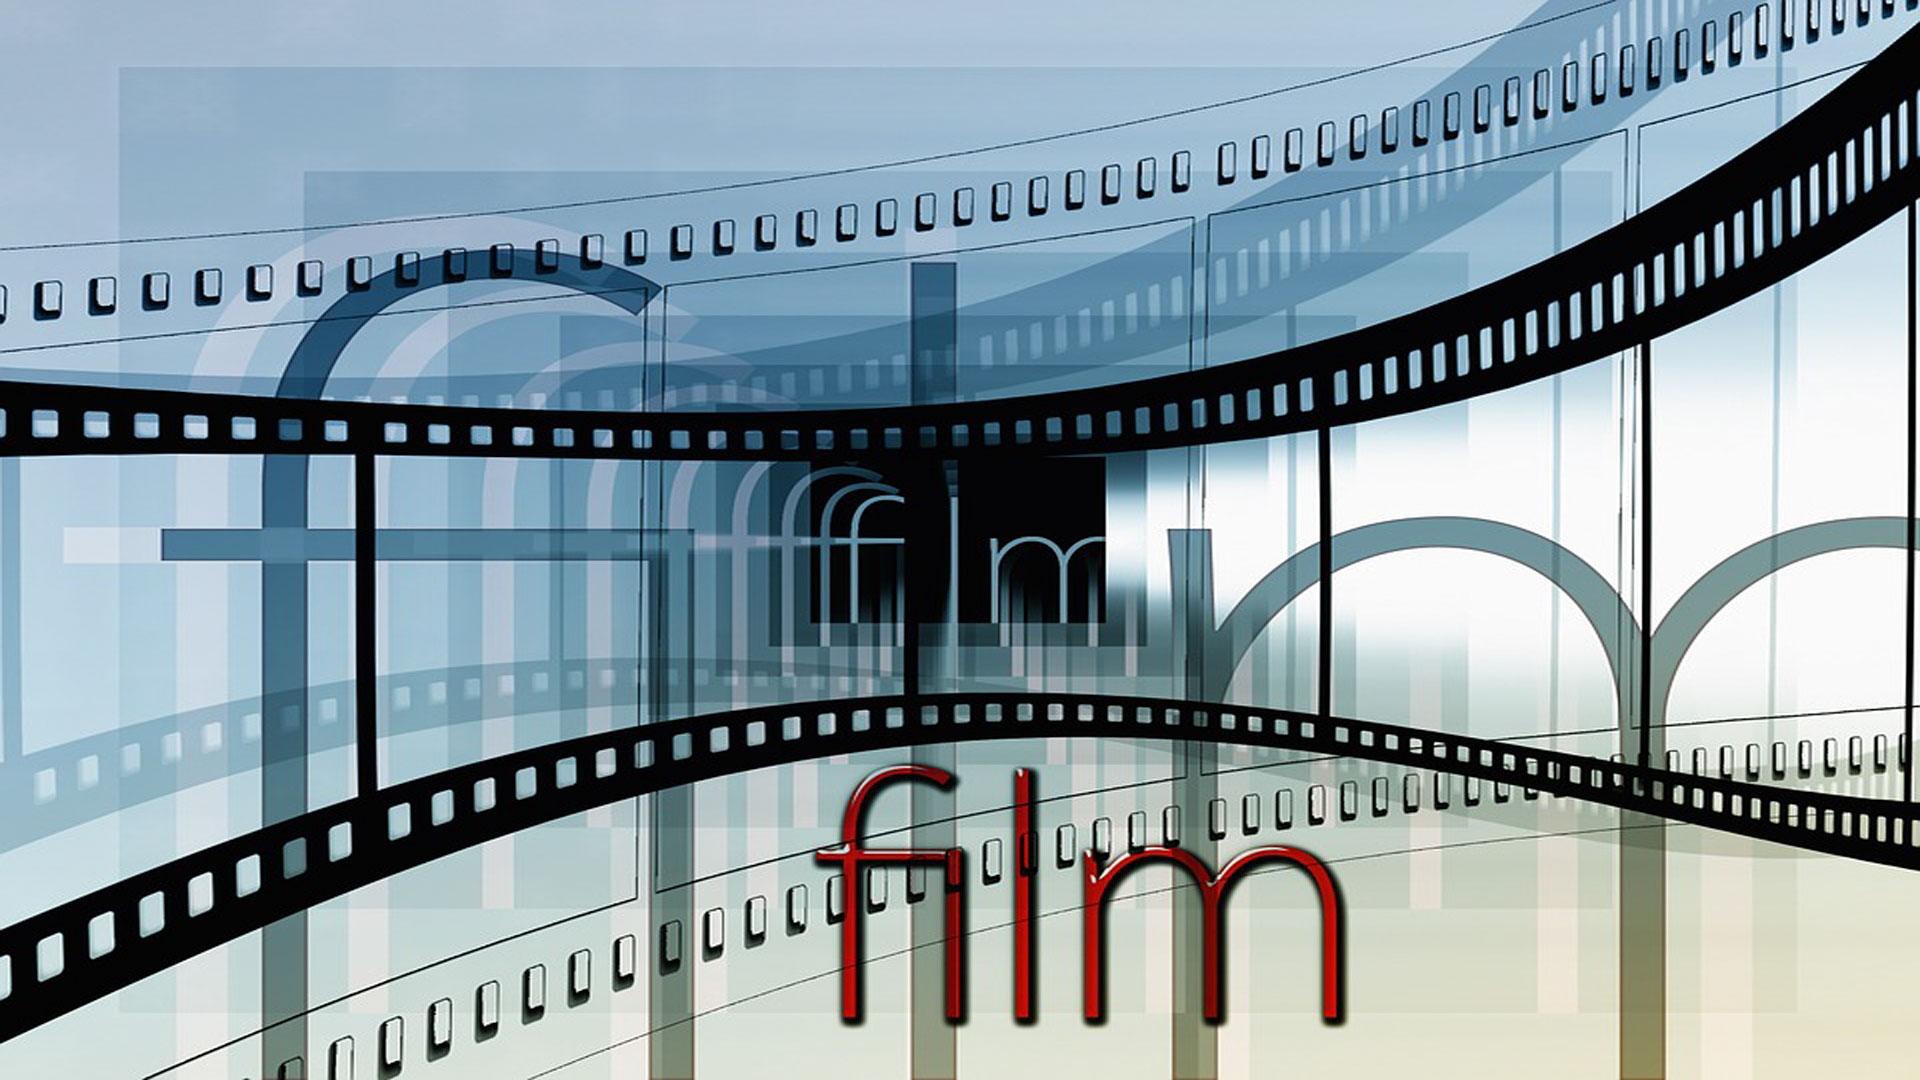 Cine-al-aire-libre-para-terminar-agosto-1920